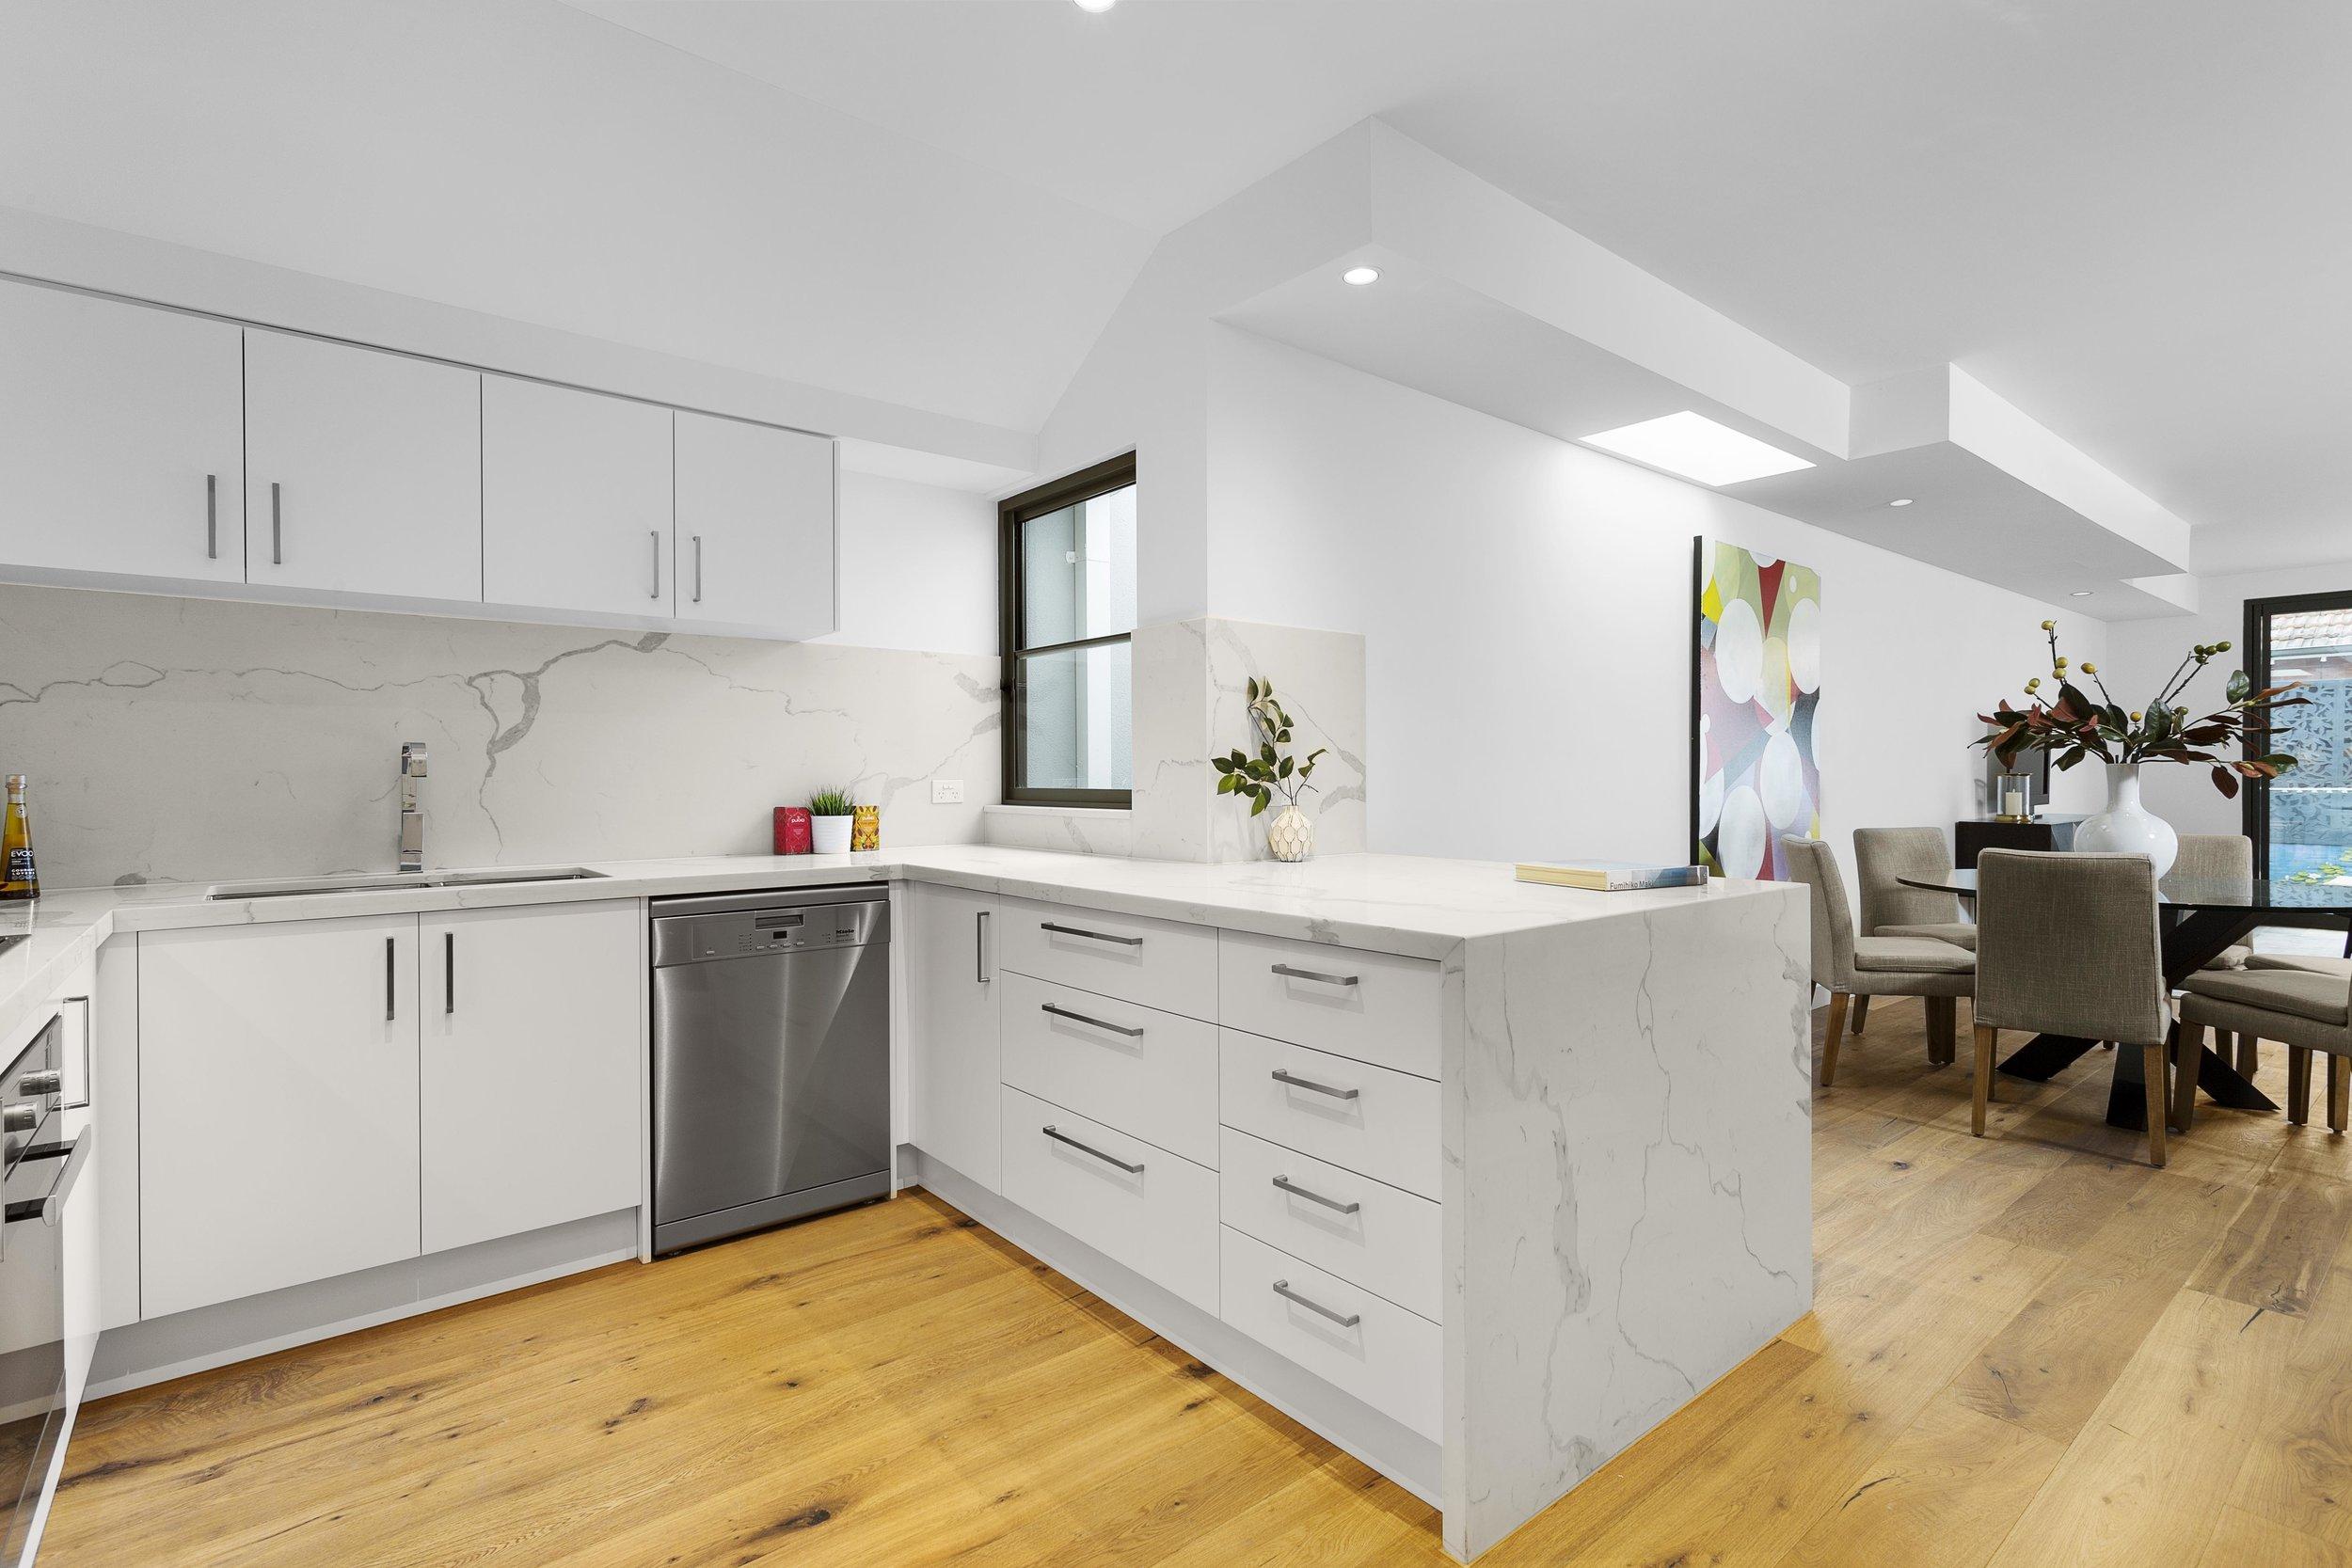 Armadale-Residence-Guymer-Bailey-Architects-04.jpg